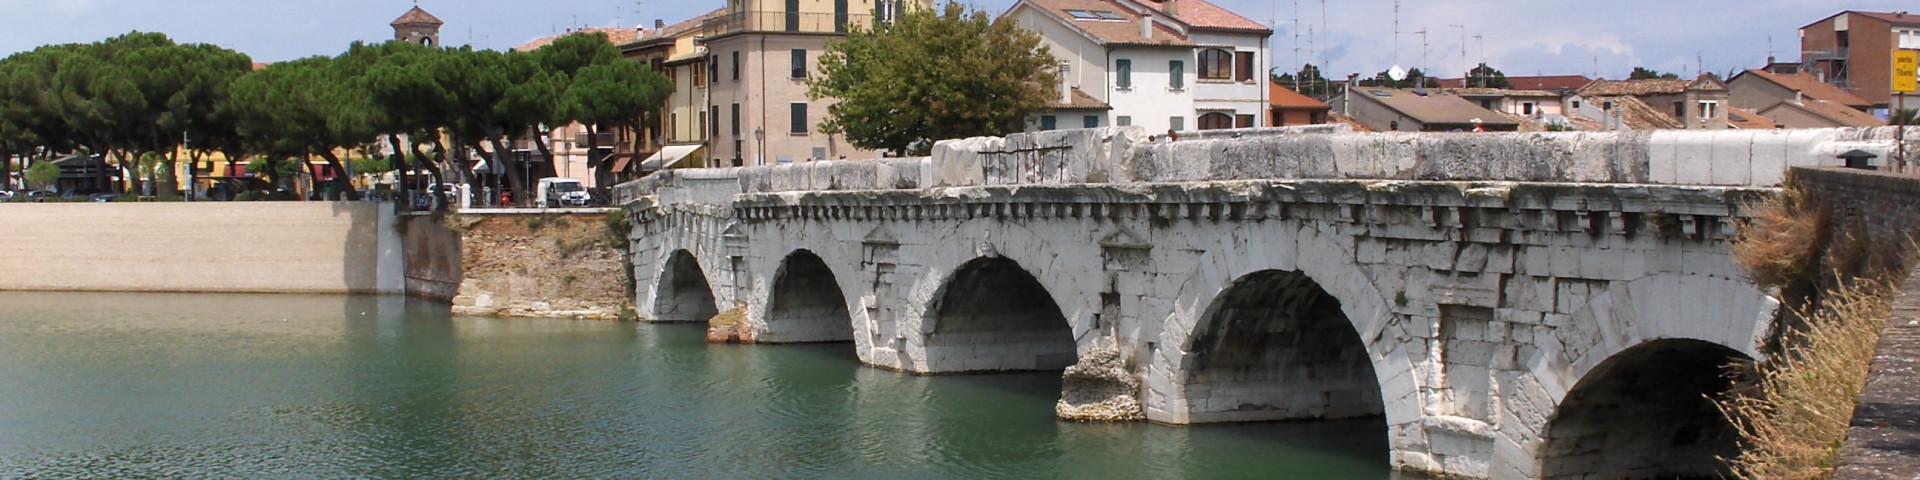 Rimini - Ponte Tiberio